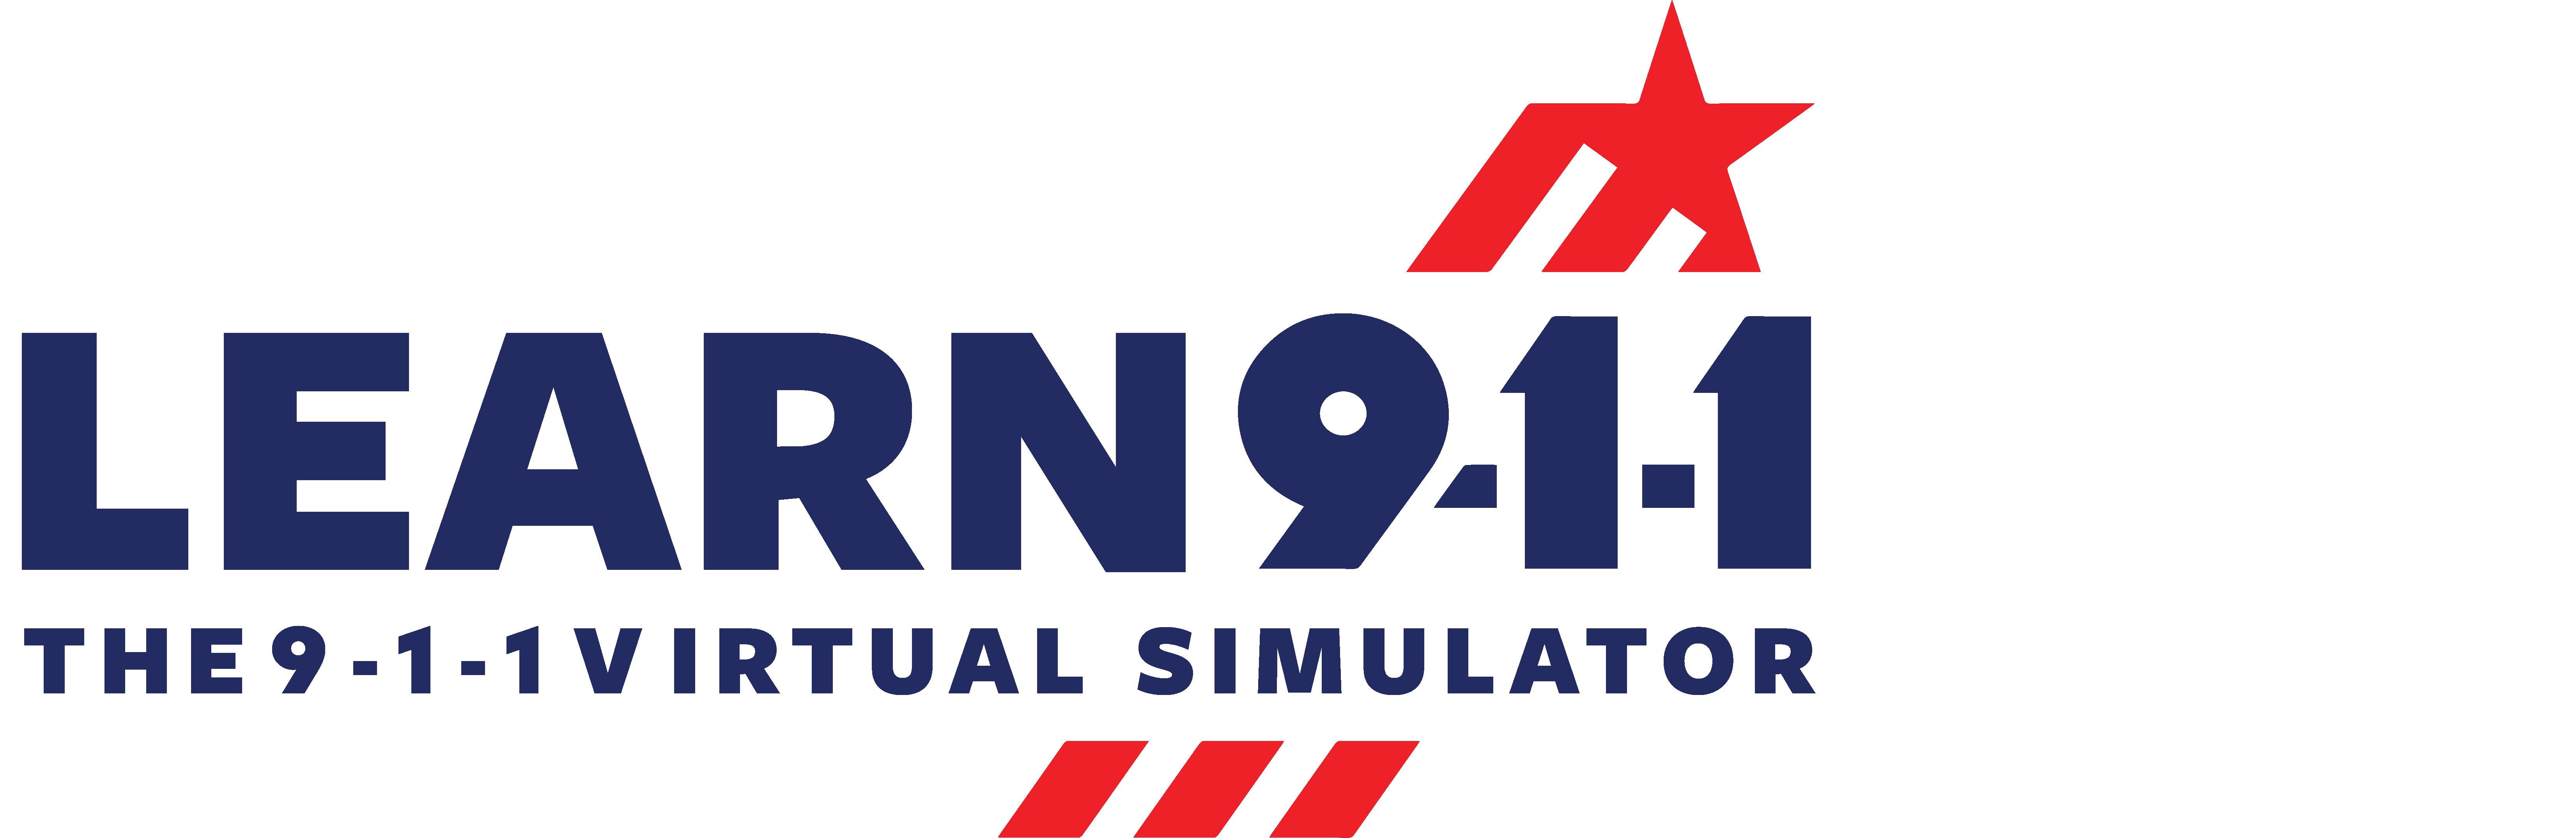 Learn 9-1-1 The 9-1-1 Virtual Simulator